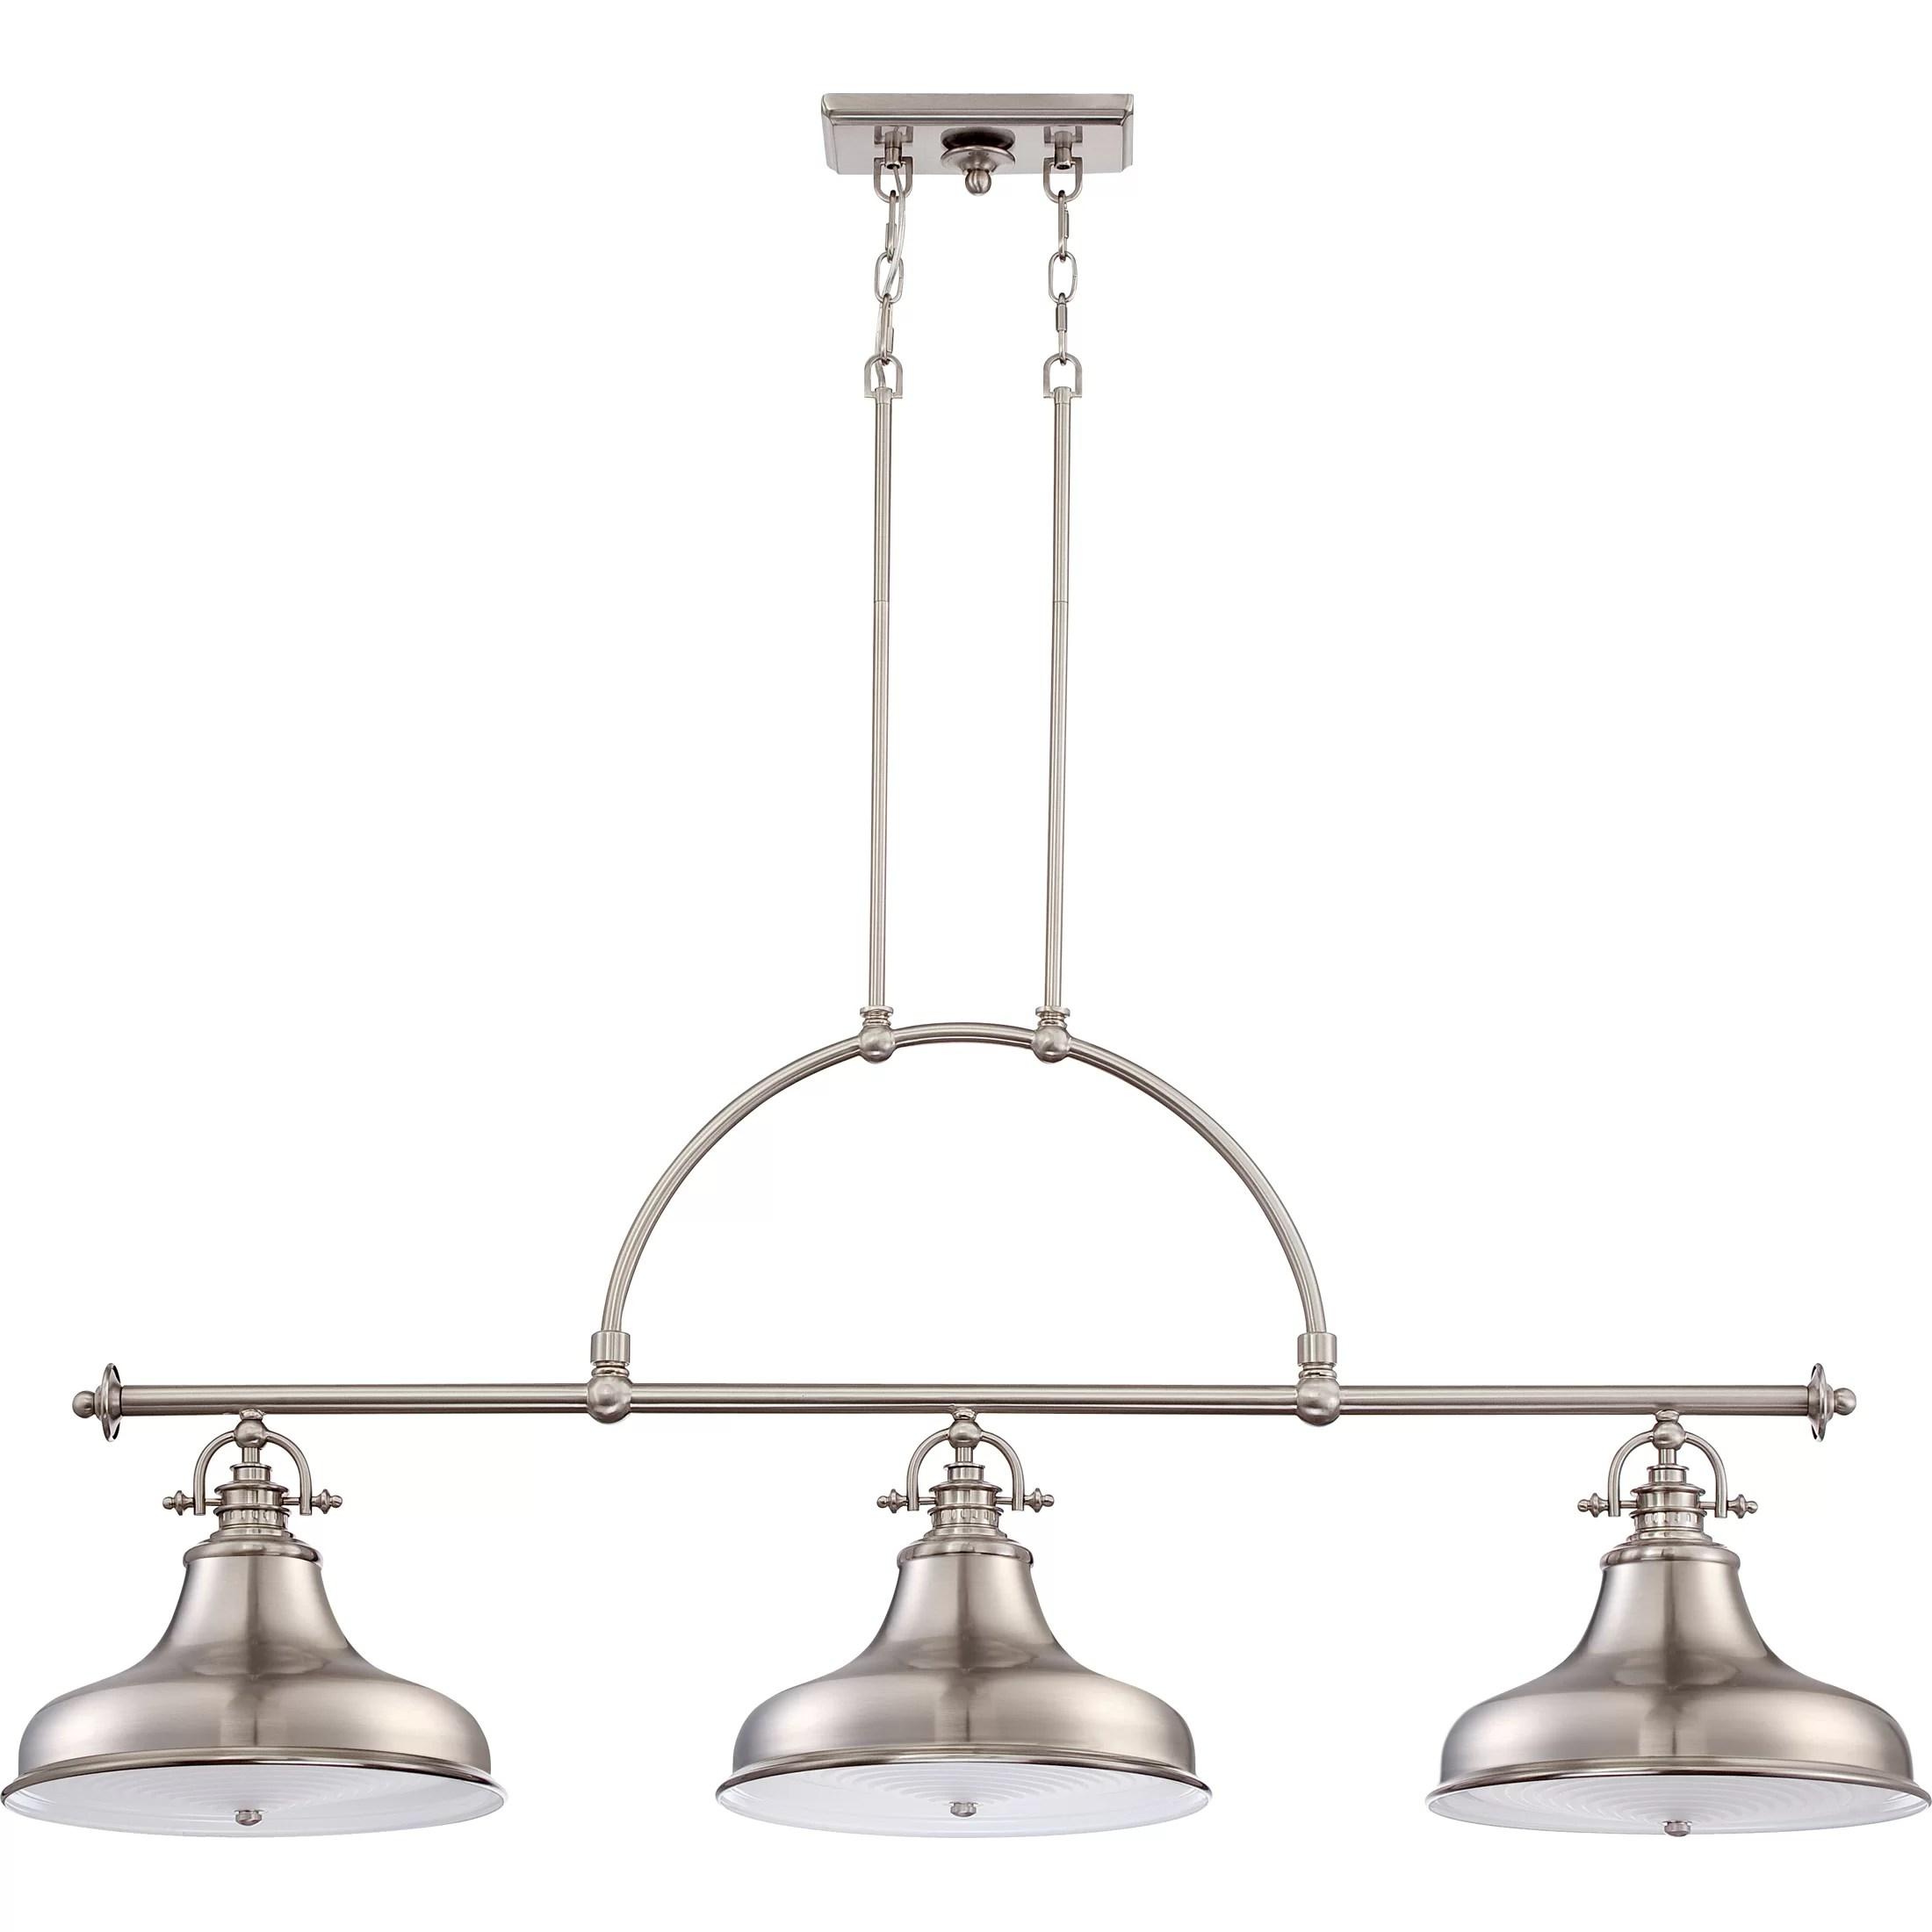 3 light kitchen island pendant chair cushion trent austin design cetona